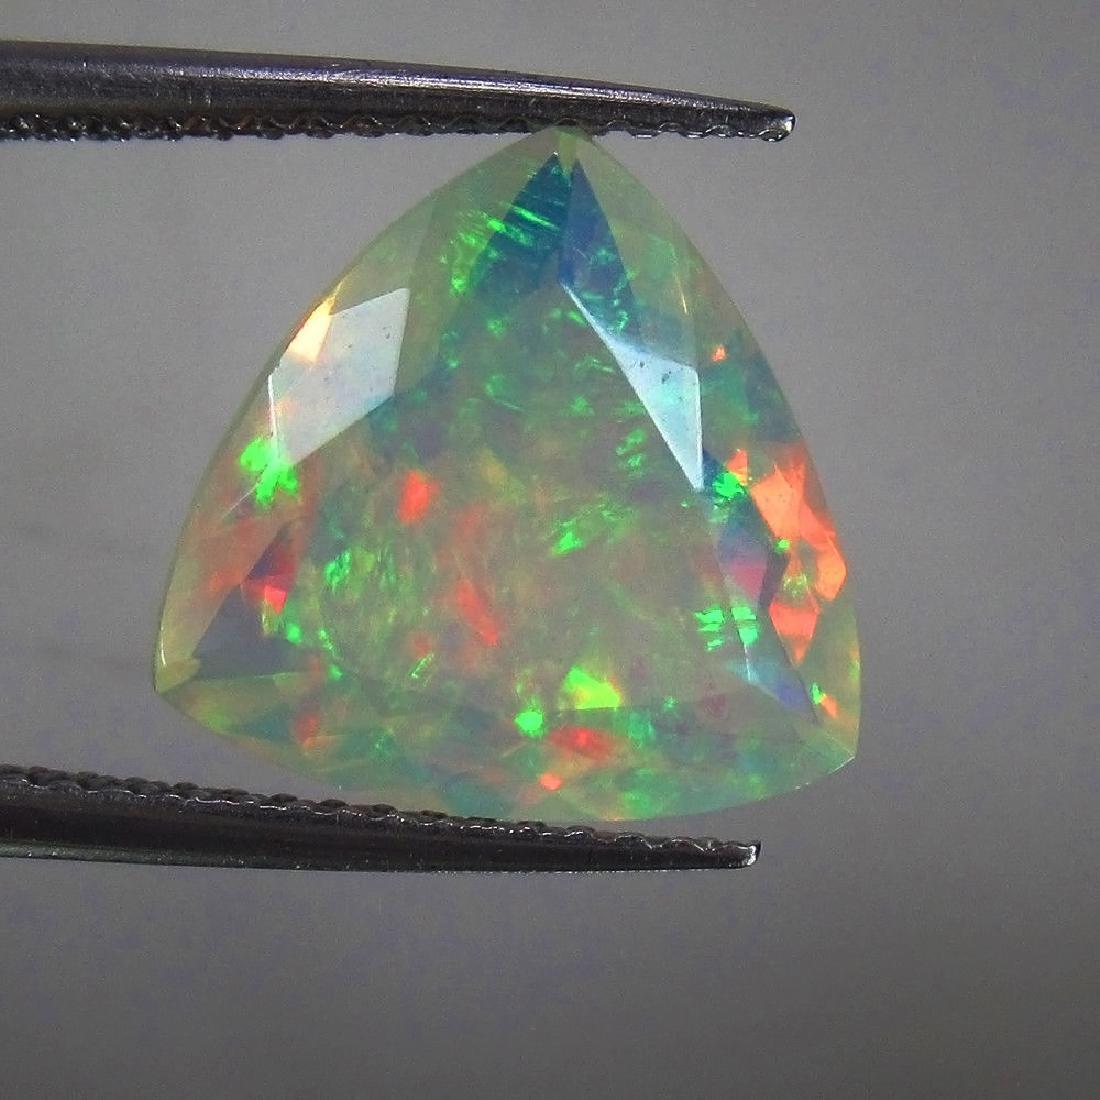 3.15 Ctw Natural Ethiopian Faceted Opal Rare Trillion